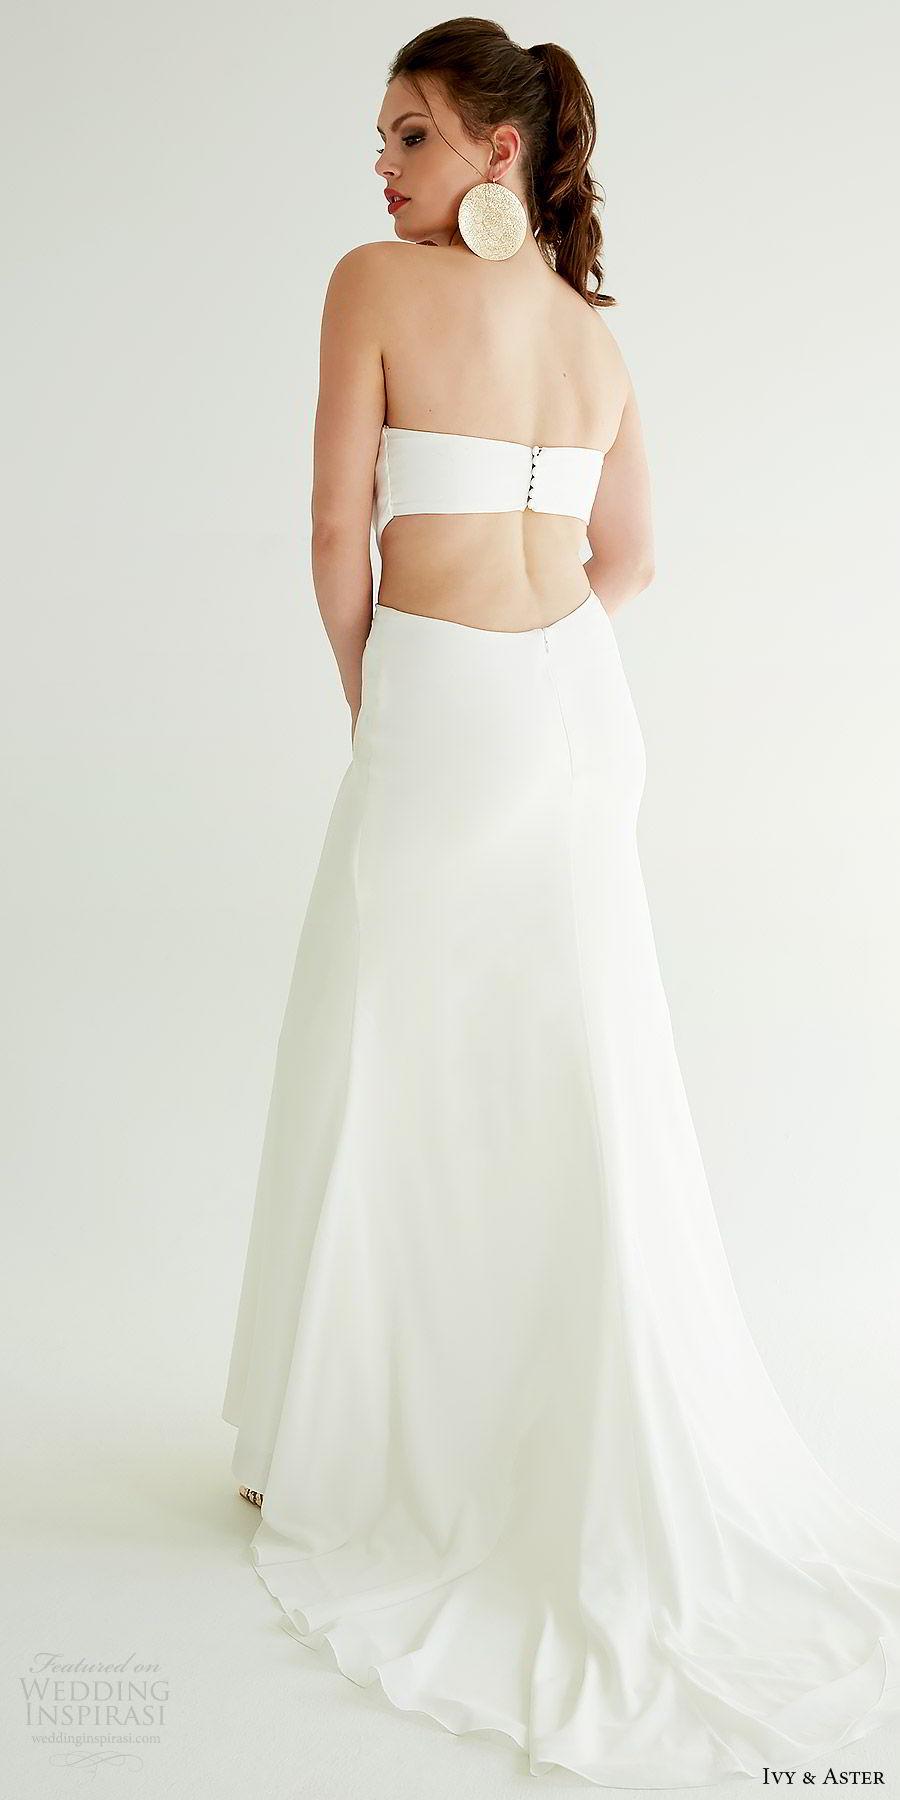 ivy aster bridal 2019 strapless straight across criss cross bodice side cutout a lineskirt wedding dress (hailee) bv clean modern chic